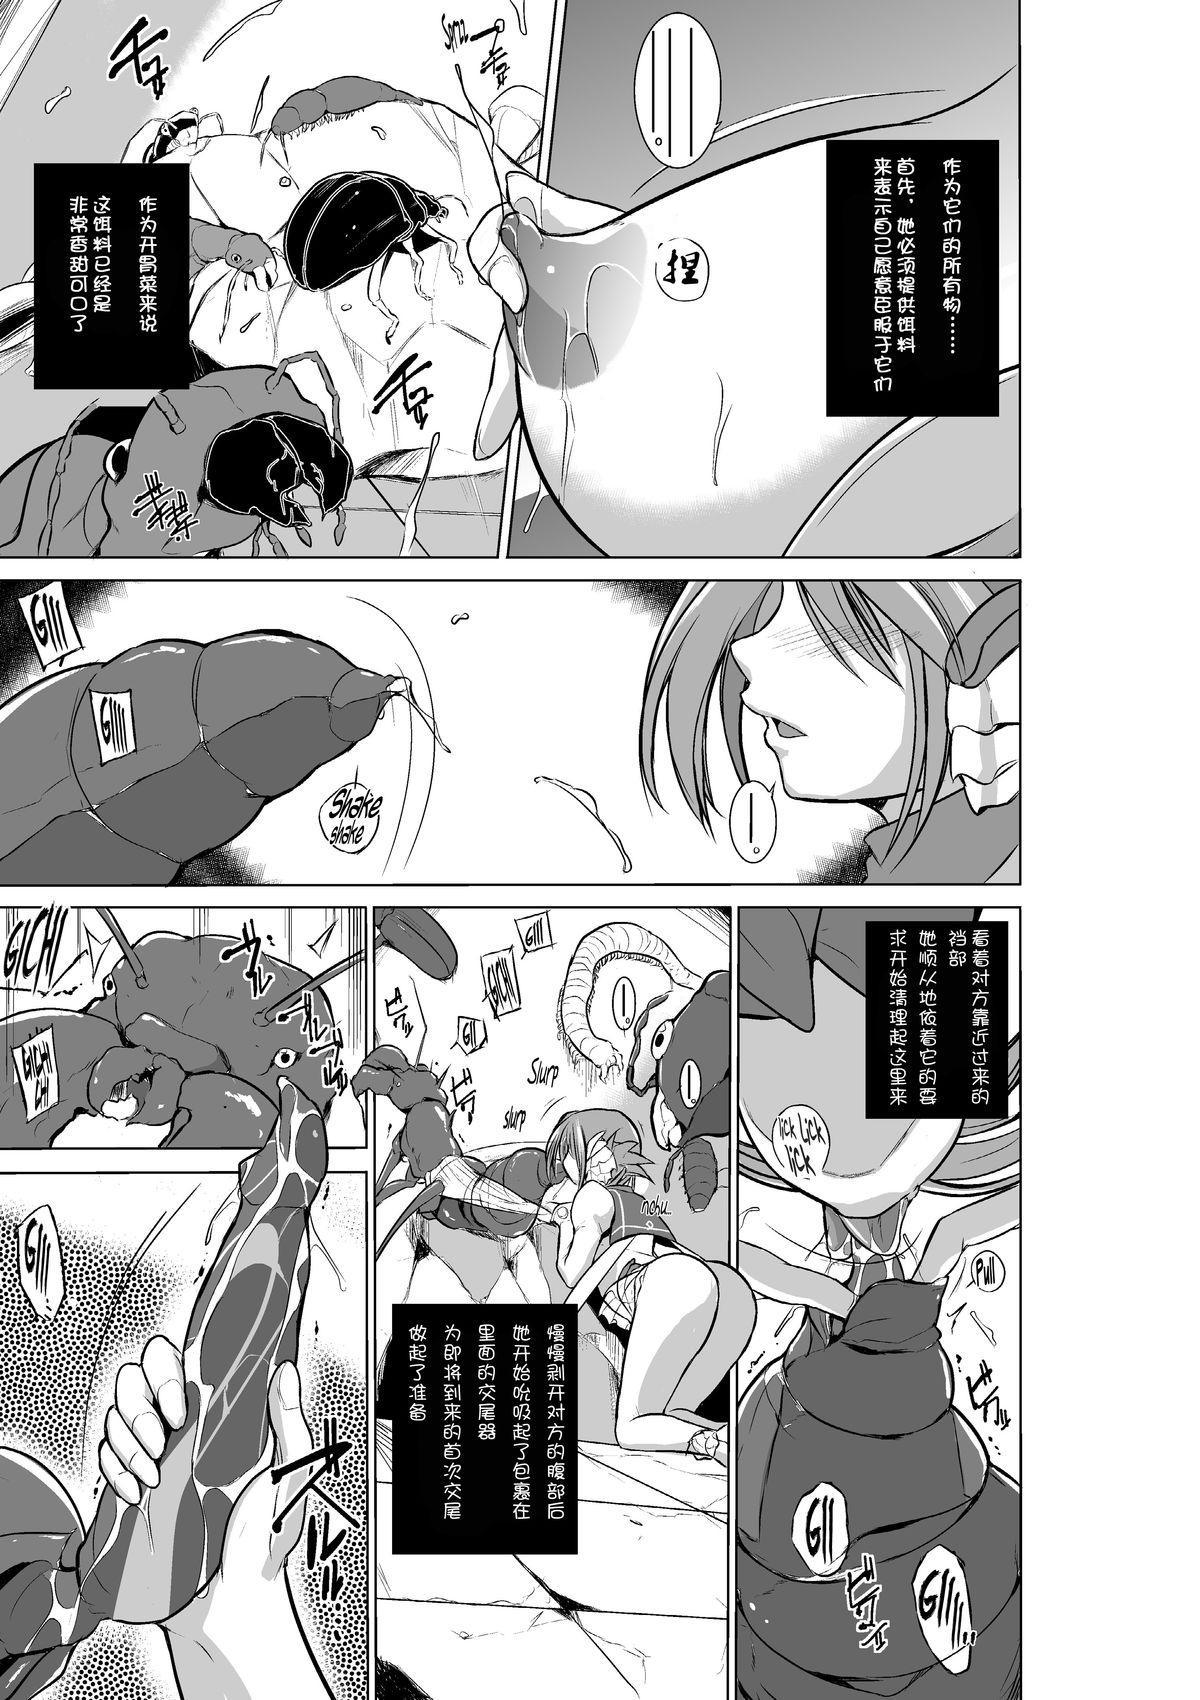 Dungeon Travelers - Manaka no Himegoto 2 4